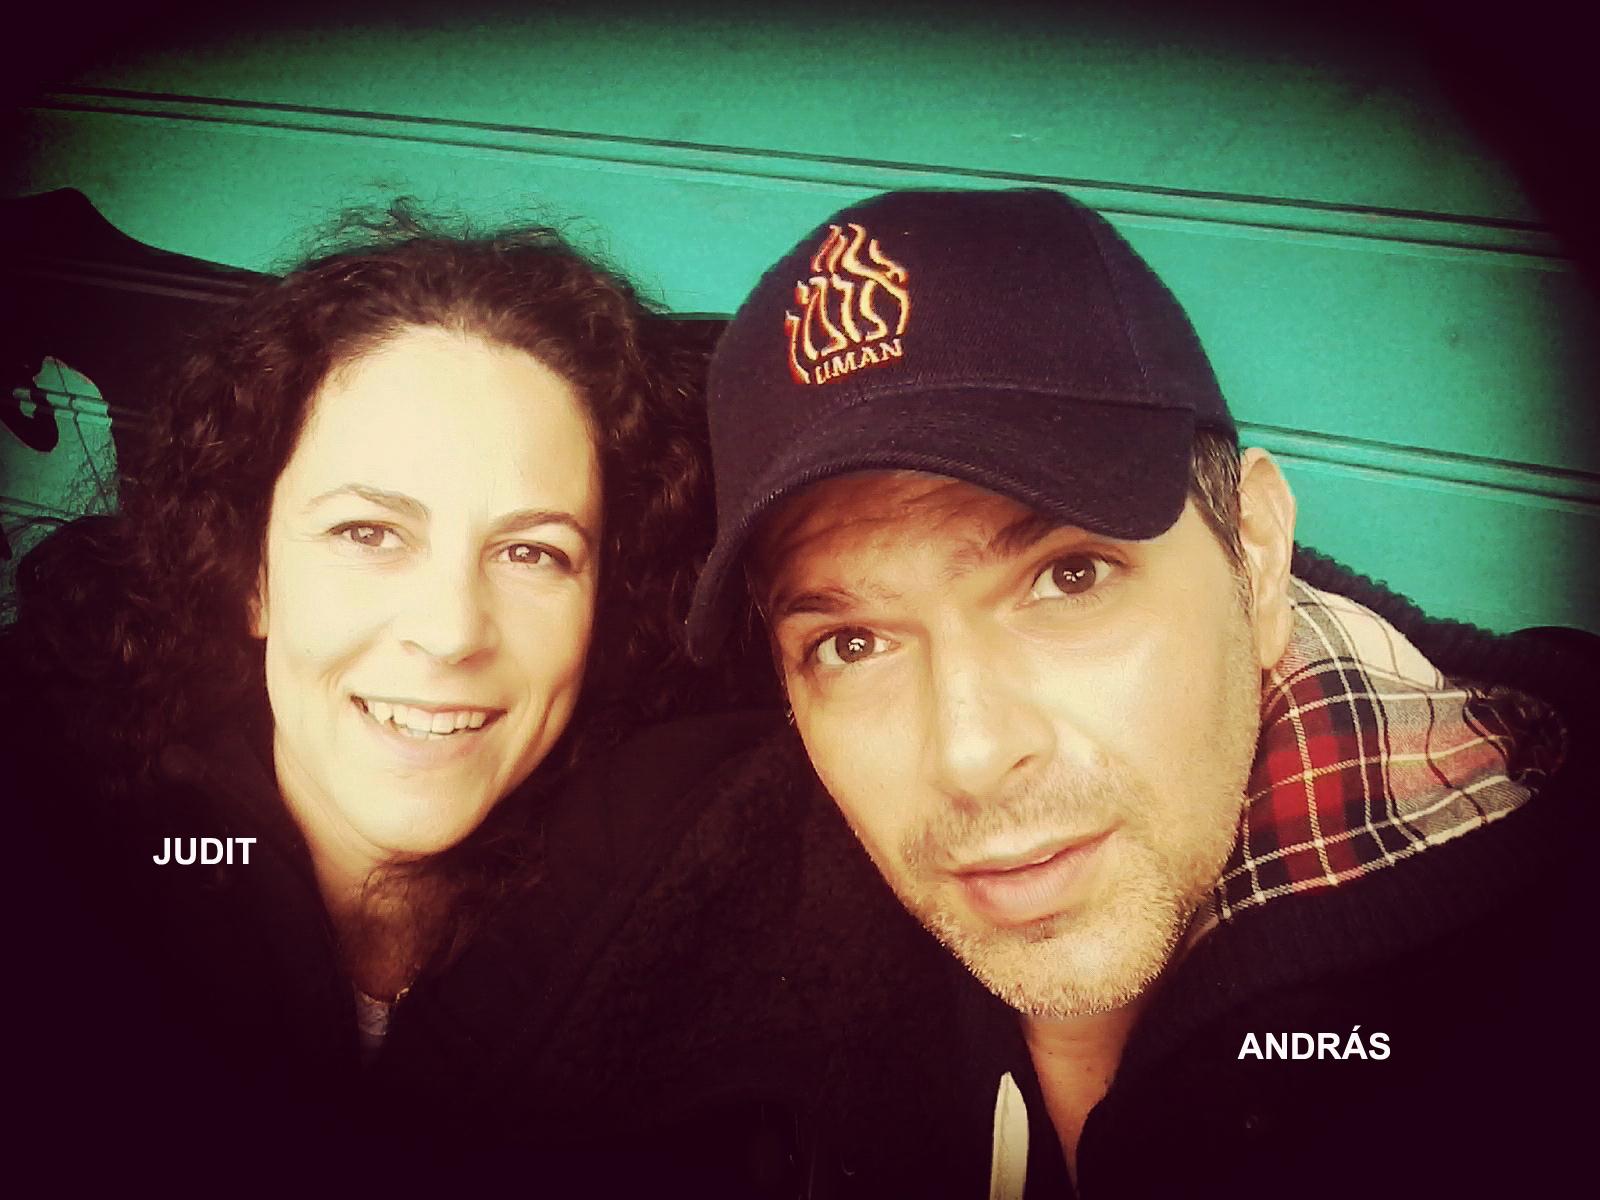 Judit & András